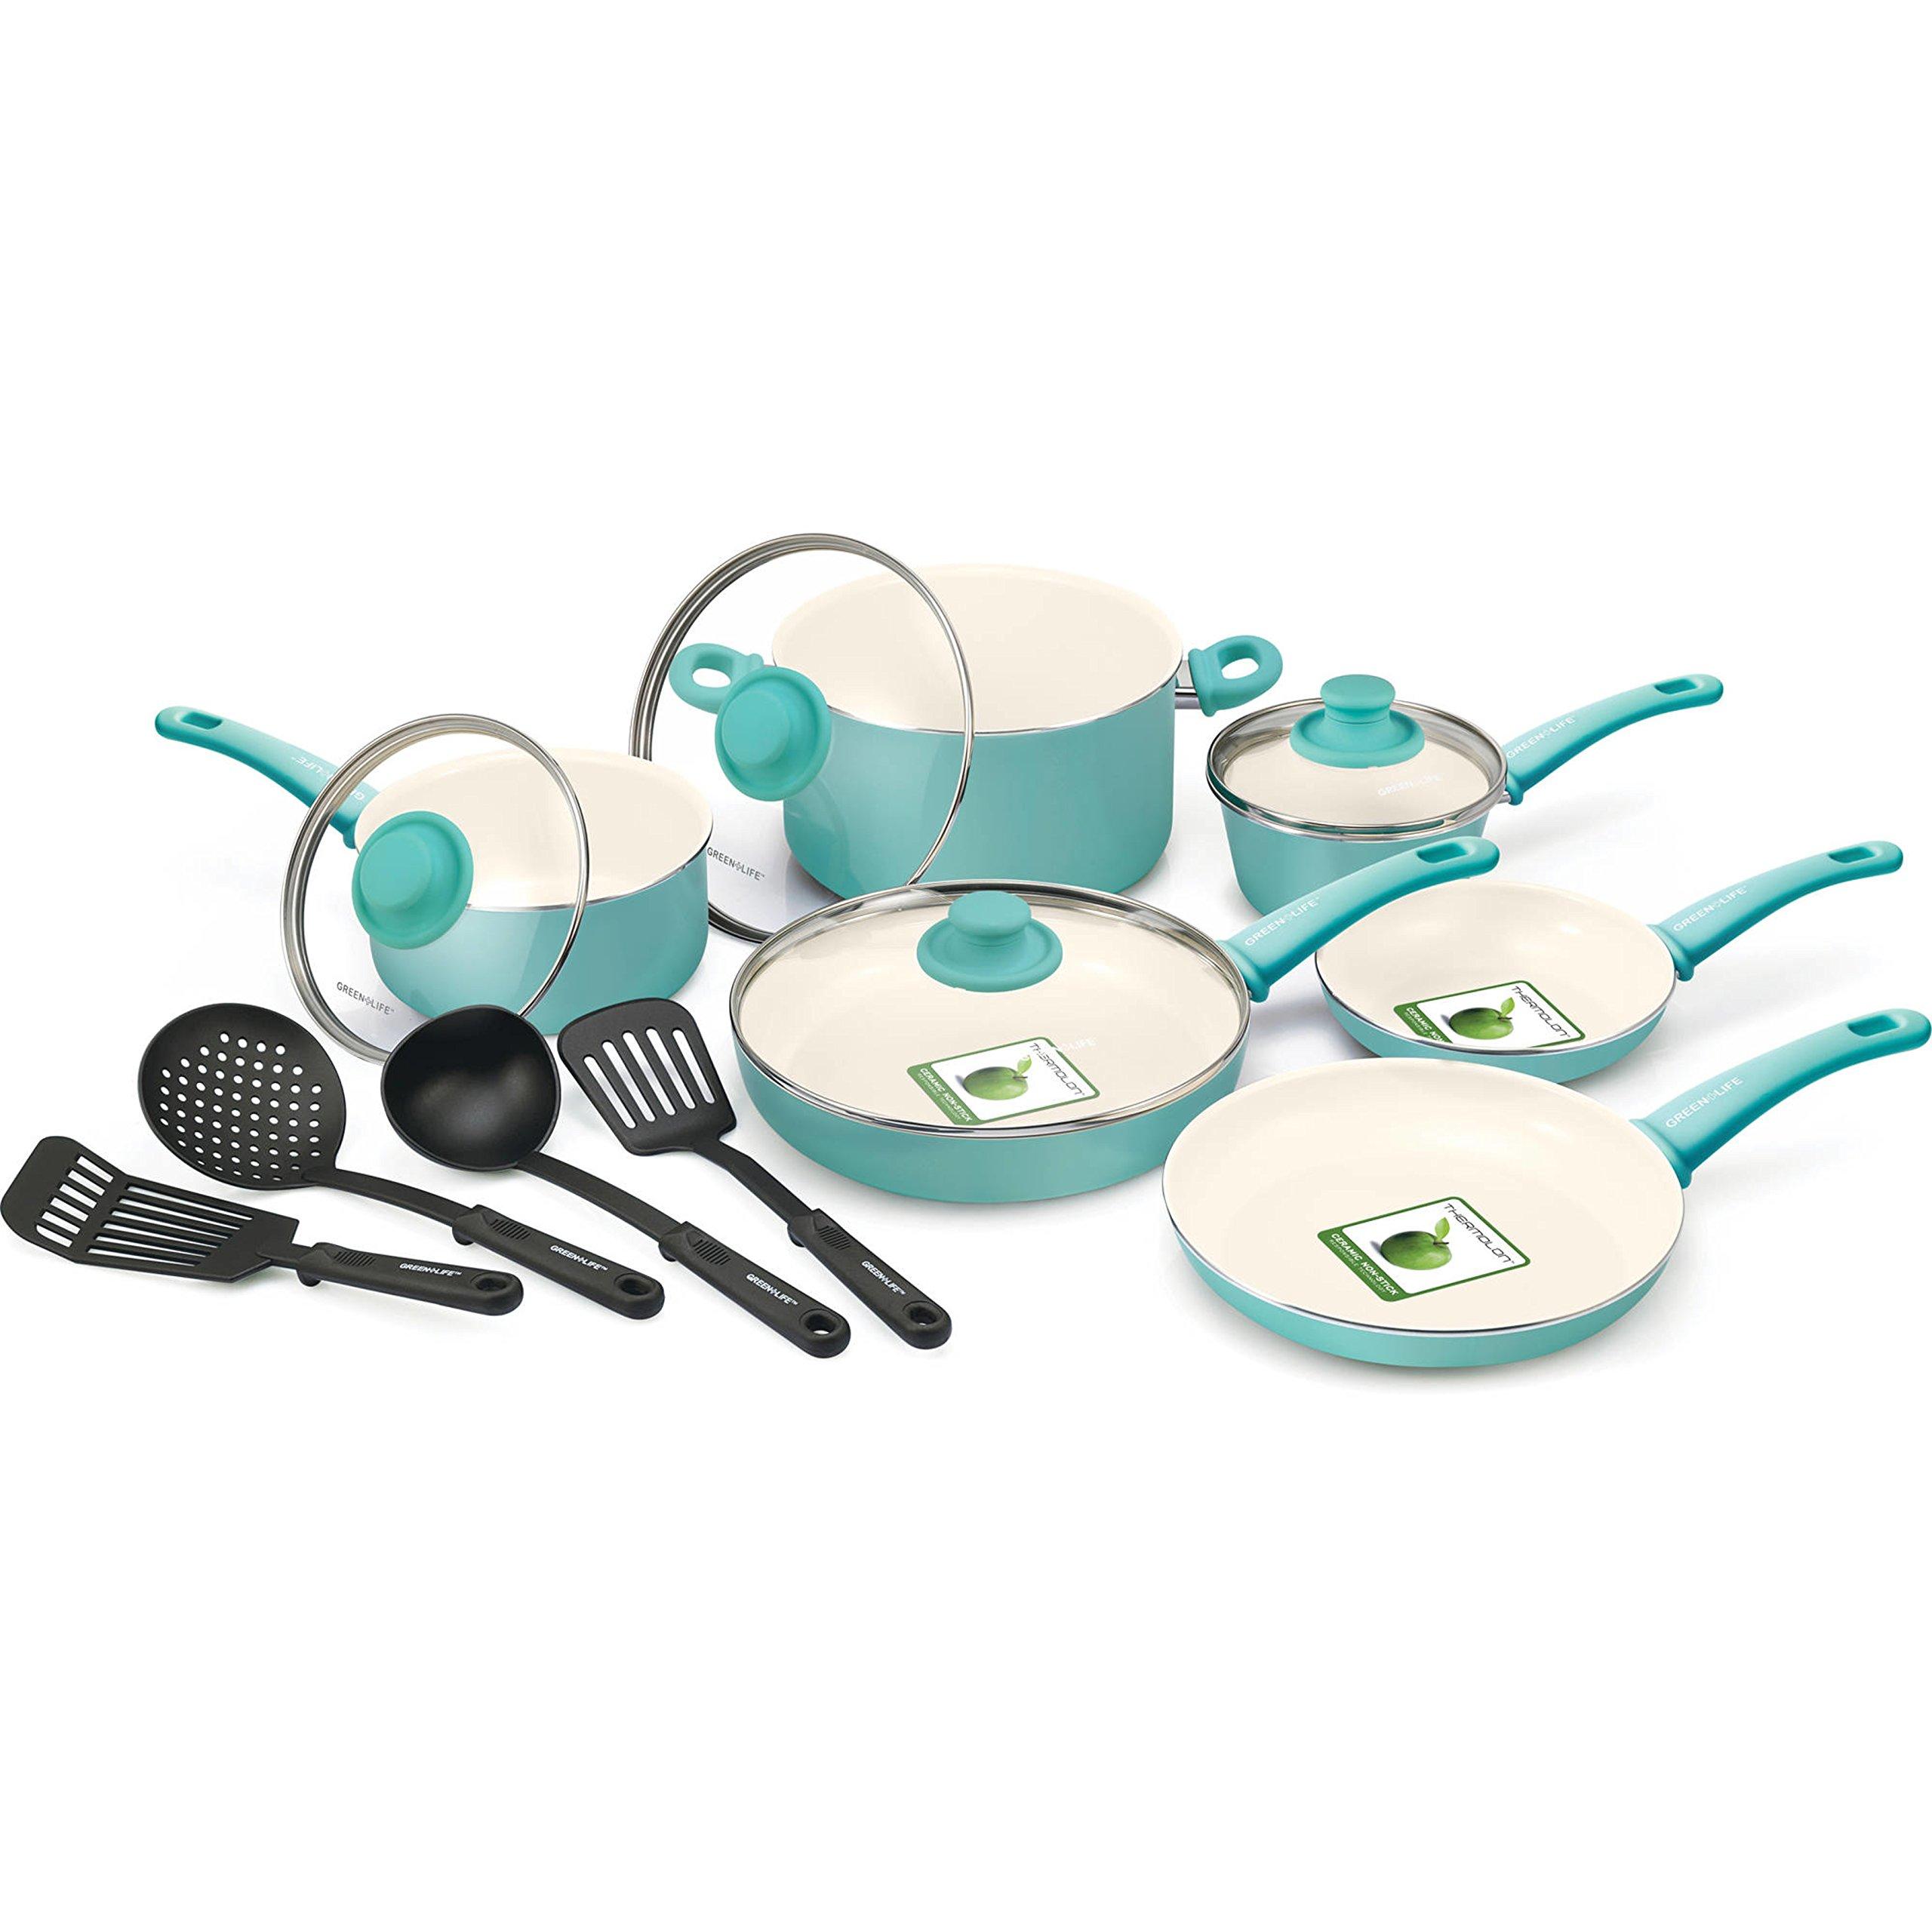 14-Piece Turquoise Ceramic Thermolon Non-Stick Ergonomic Handles Cookware Set